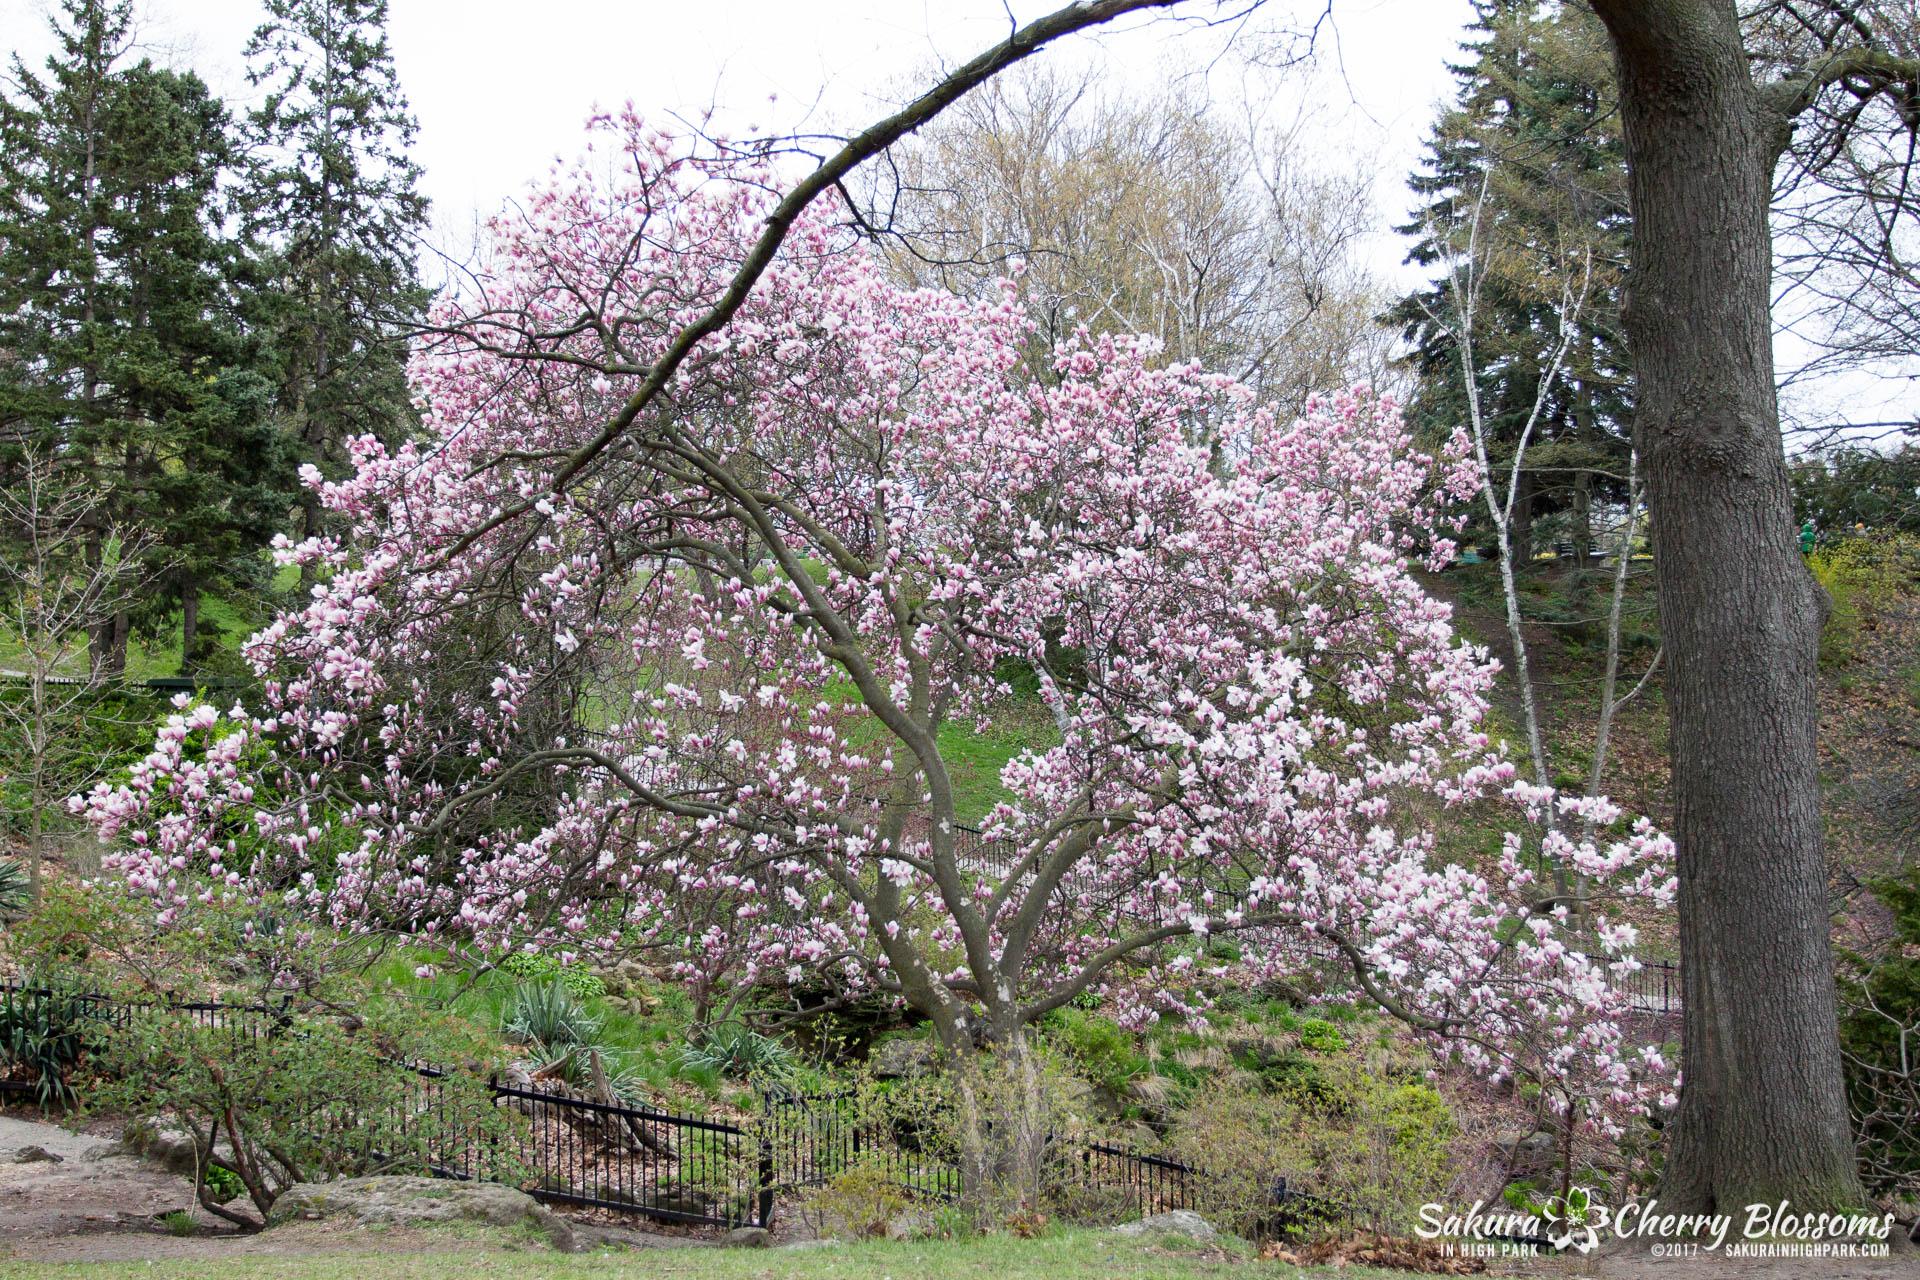 Sakura-Watch-May-2-2017-cherry-blossoms-falling-in-High-Park-104.jpg